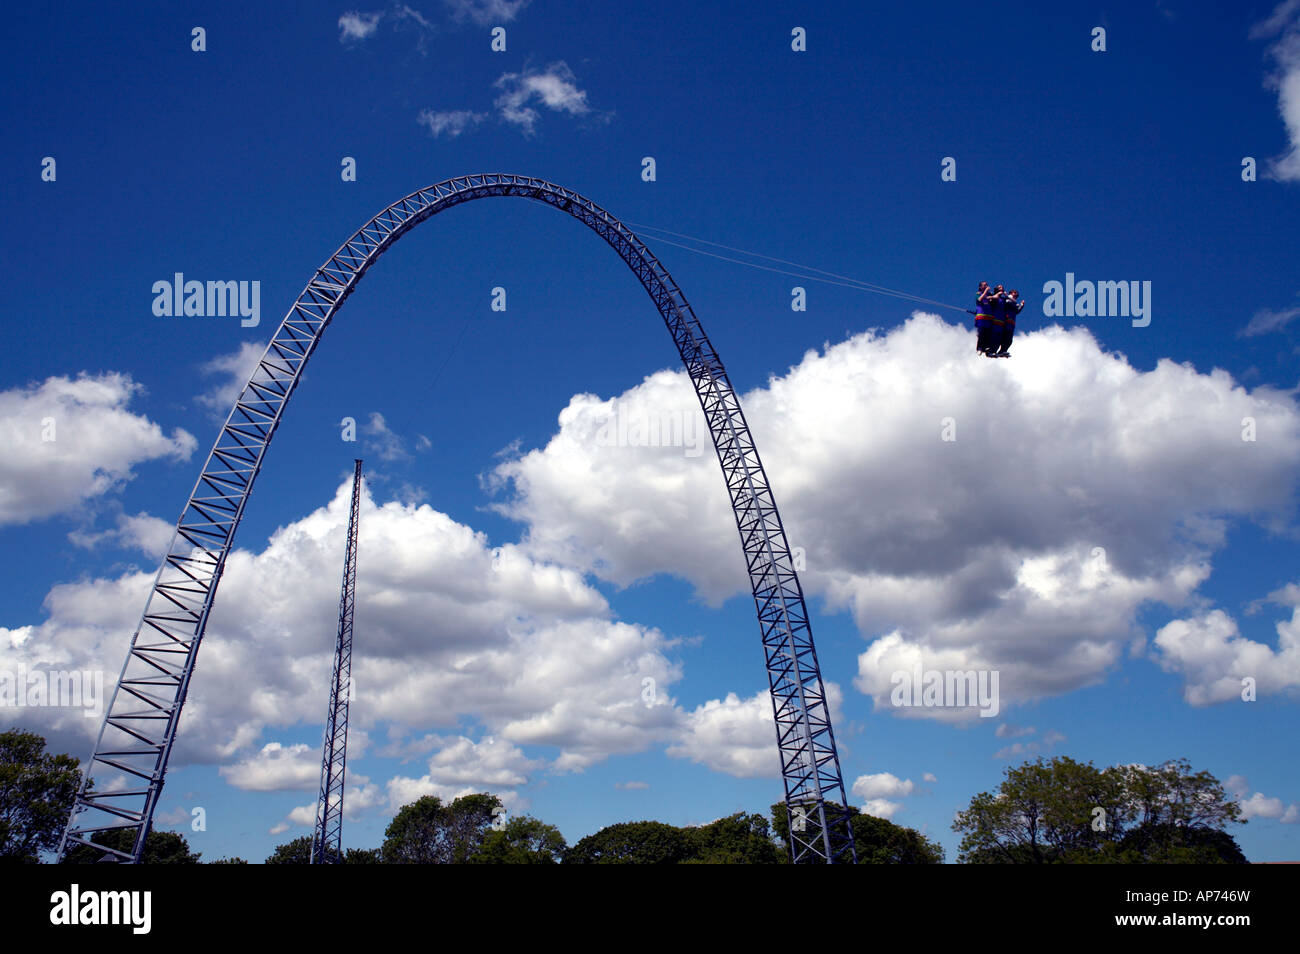 Vertigo Ride Oakwood Theme Park - Stock Image